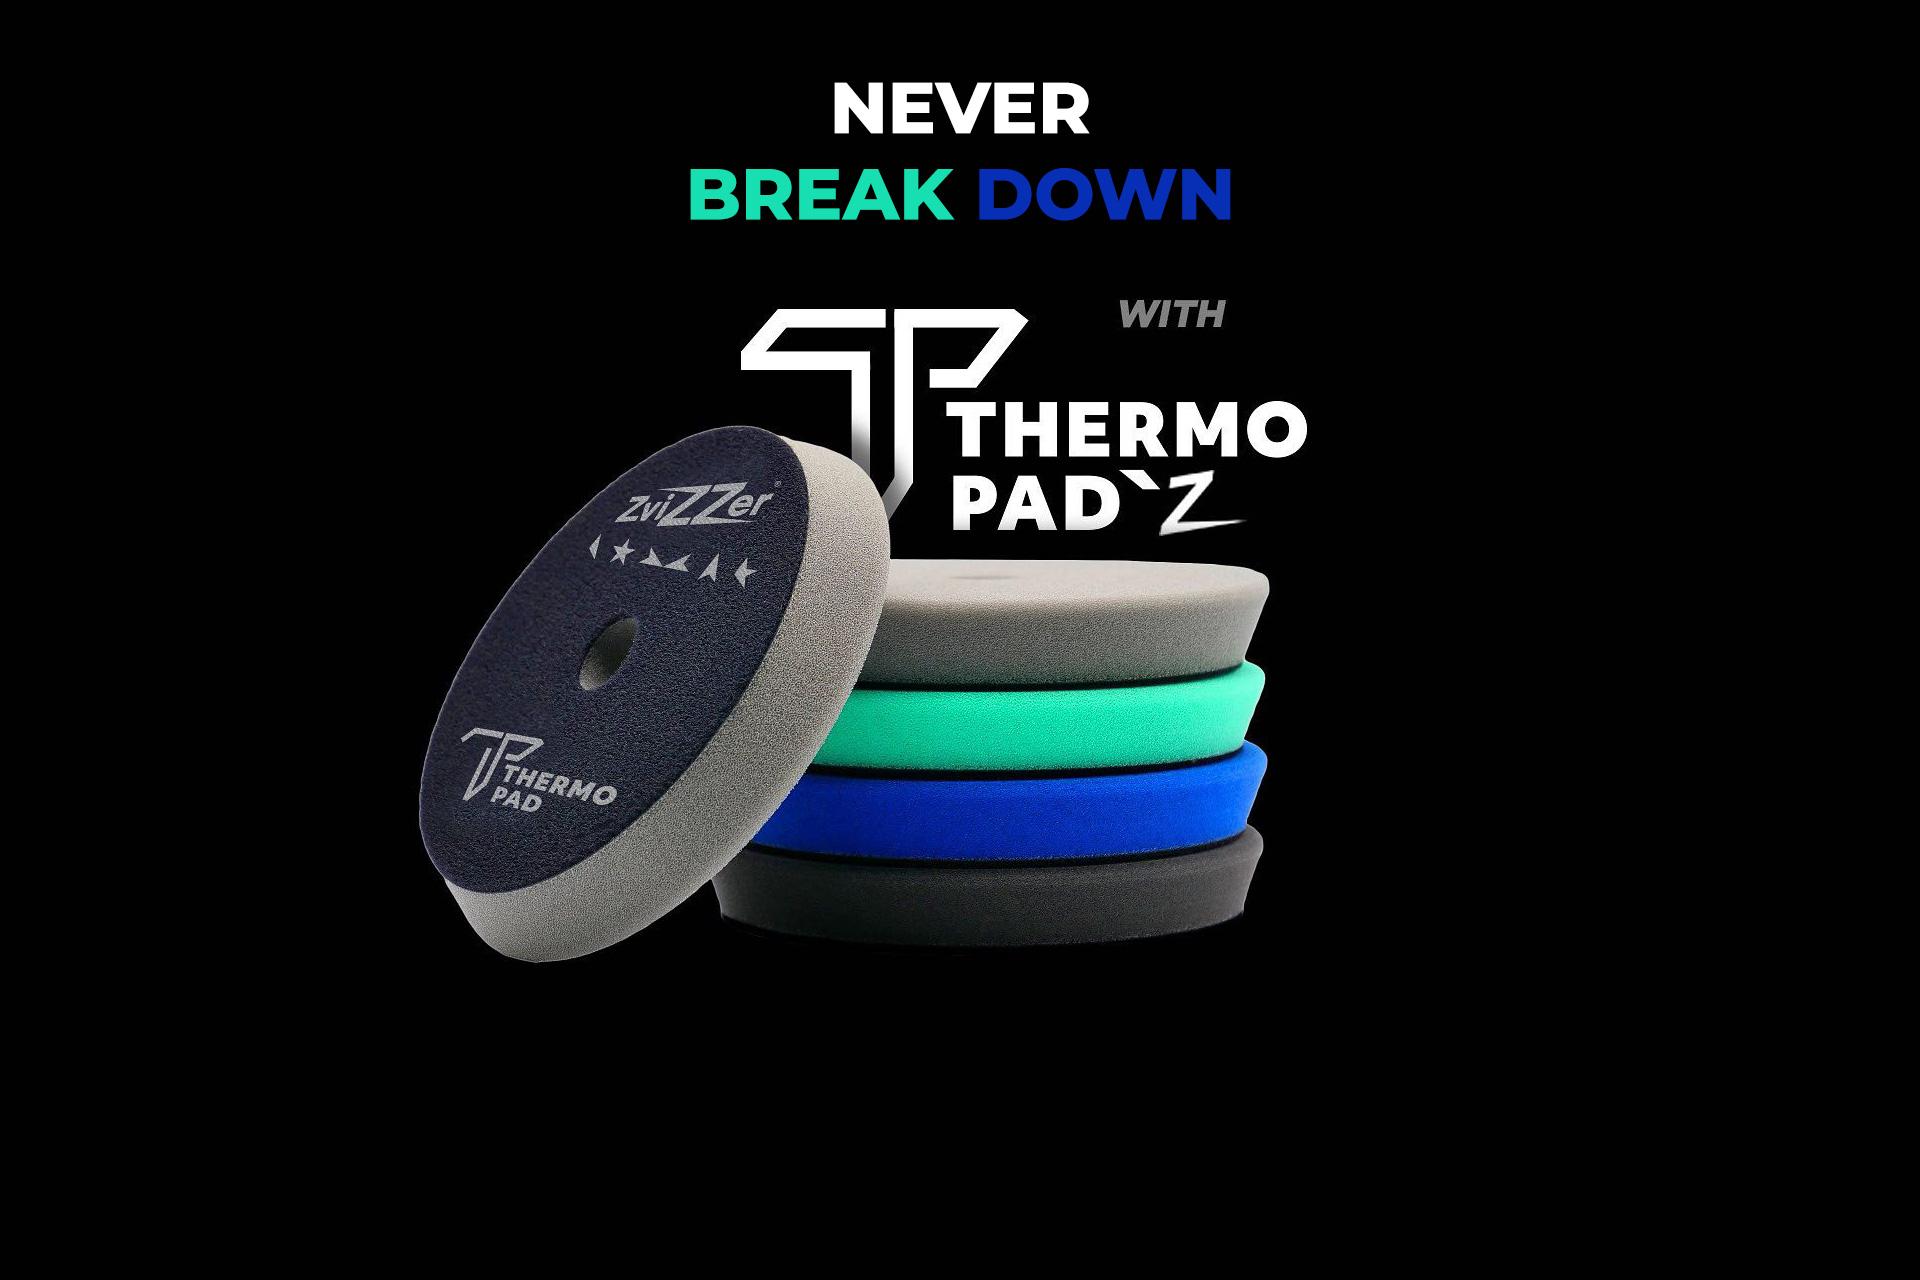 Zvizzer Thermo Pad's - Never Break Down